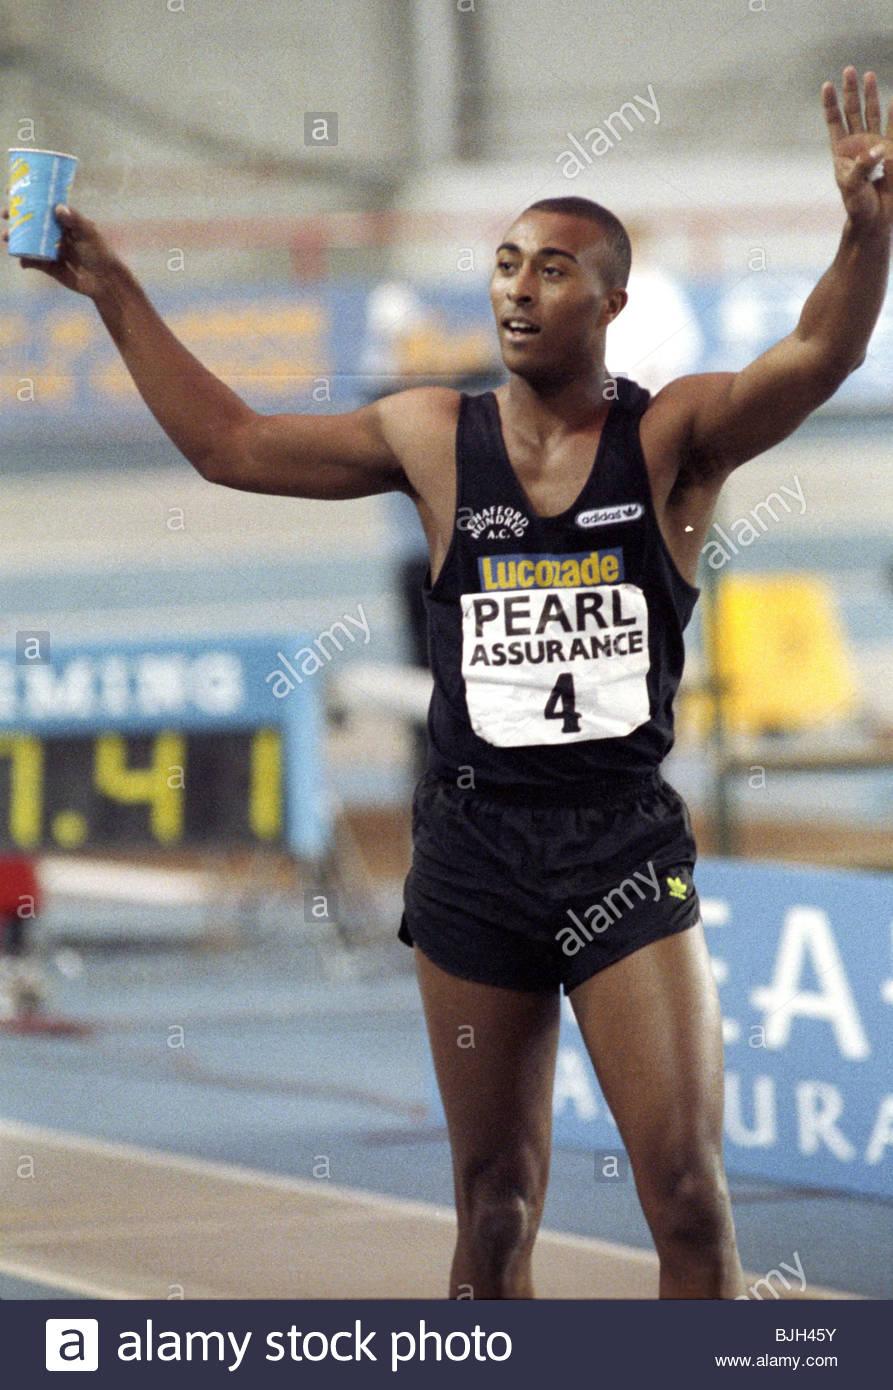 08/02/92 PEARL ASSURANCE GAMES KELVIN HALL - GLASGOW Colin Jackson - Stock Image